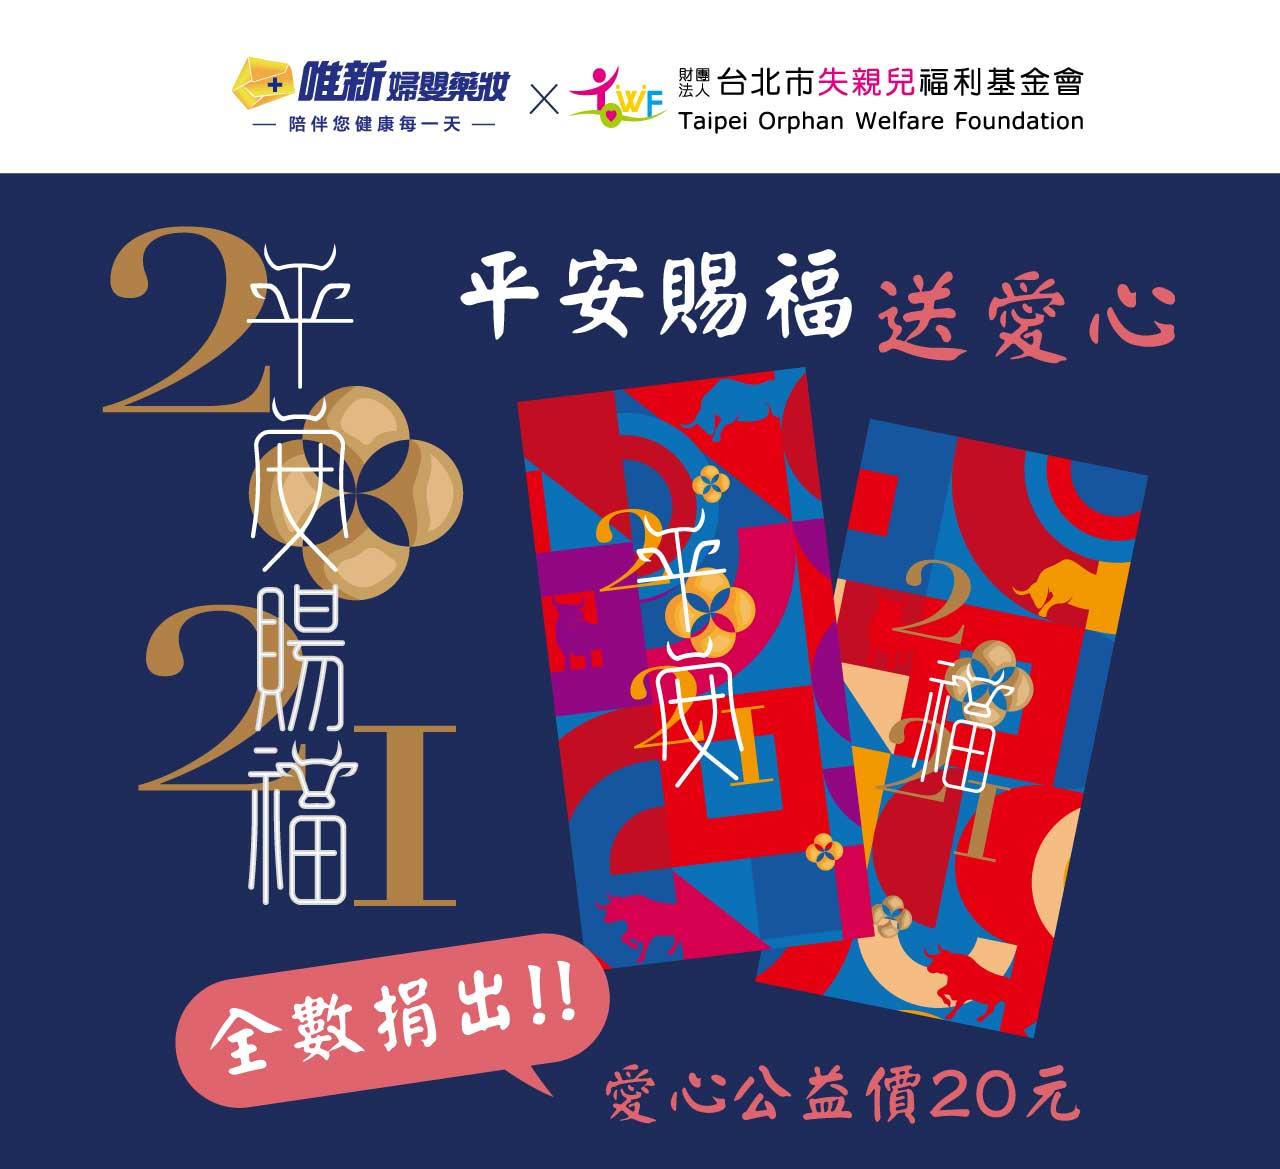 proimages/news/2021/20210125_一般-公益紅包袋.jpg